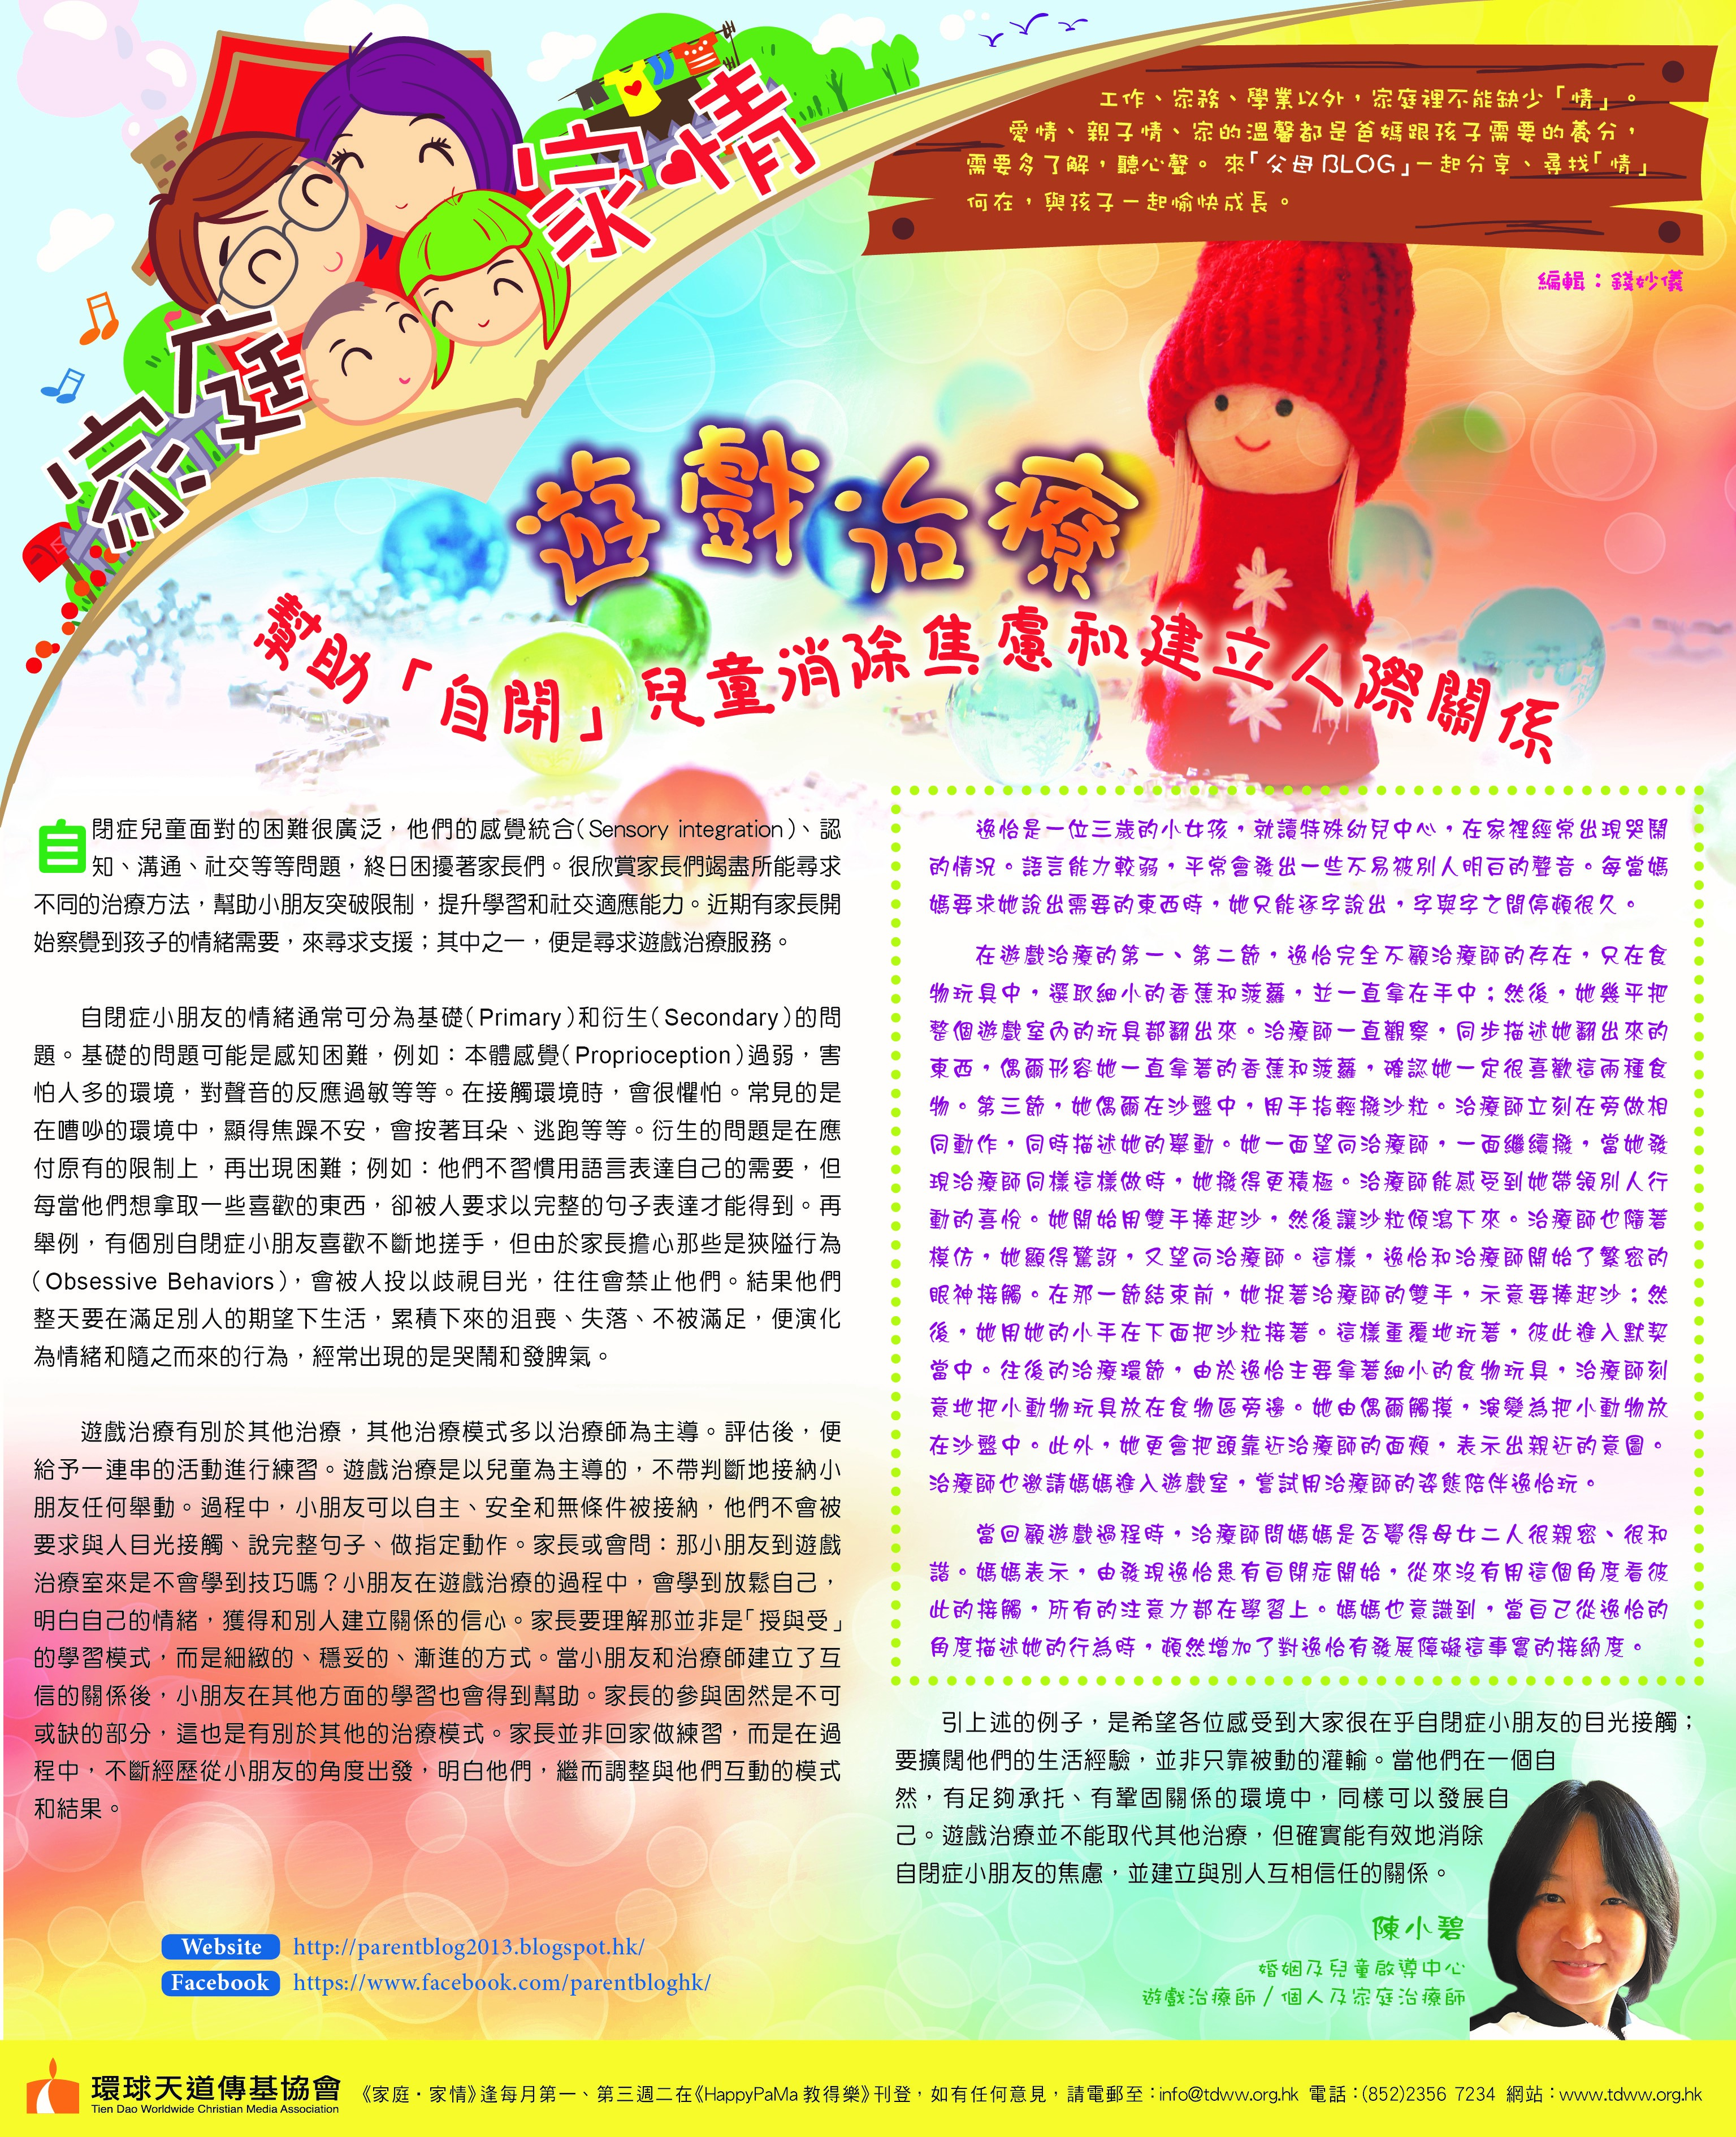 Mingpao-output-04April